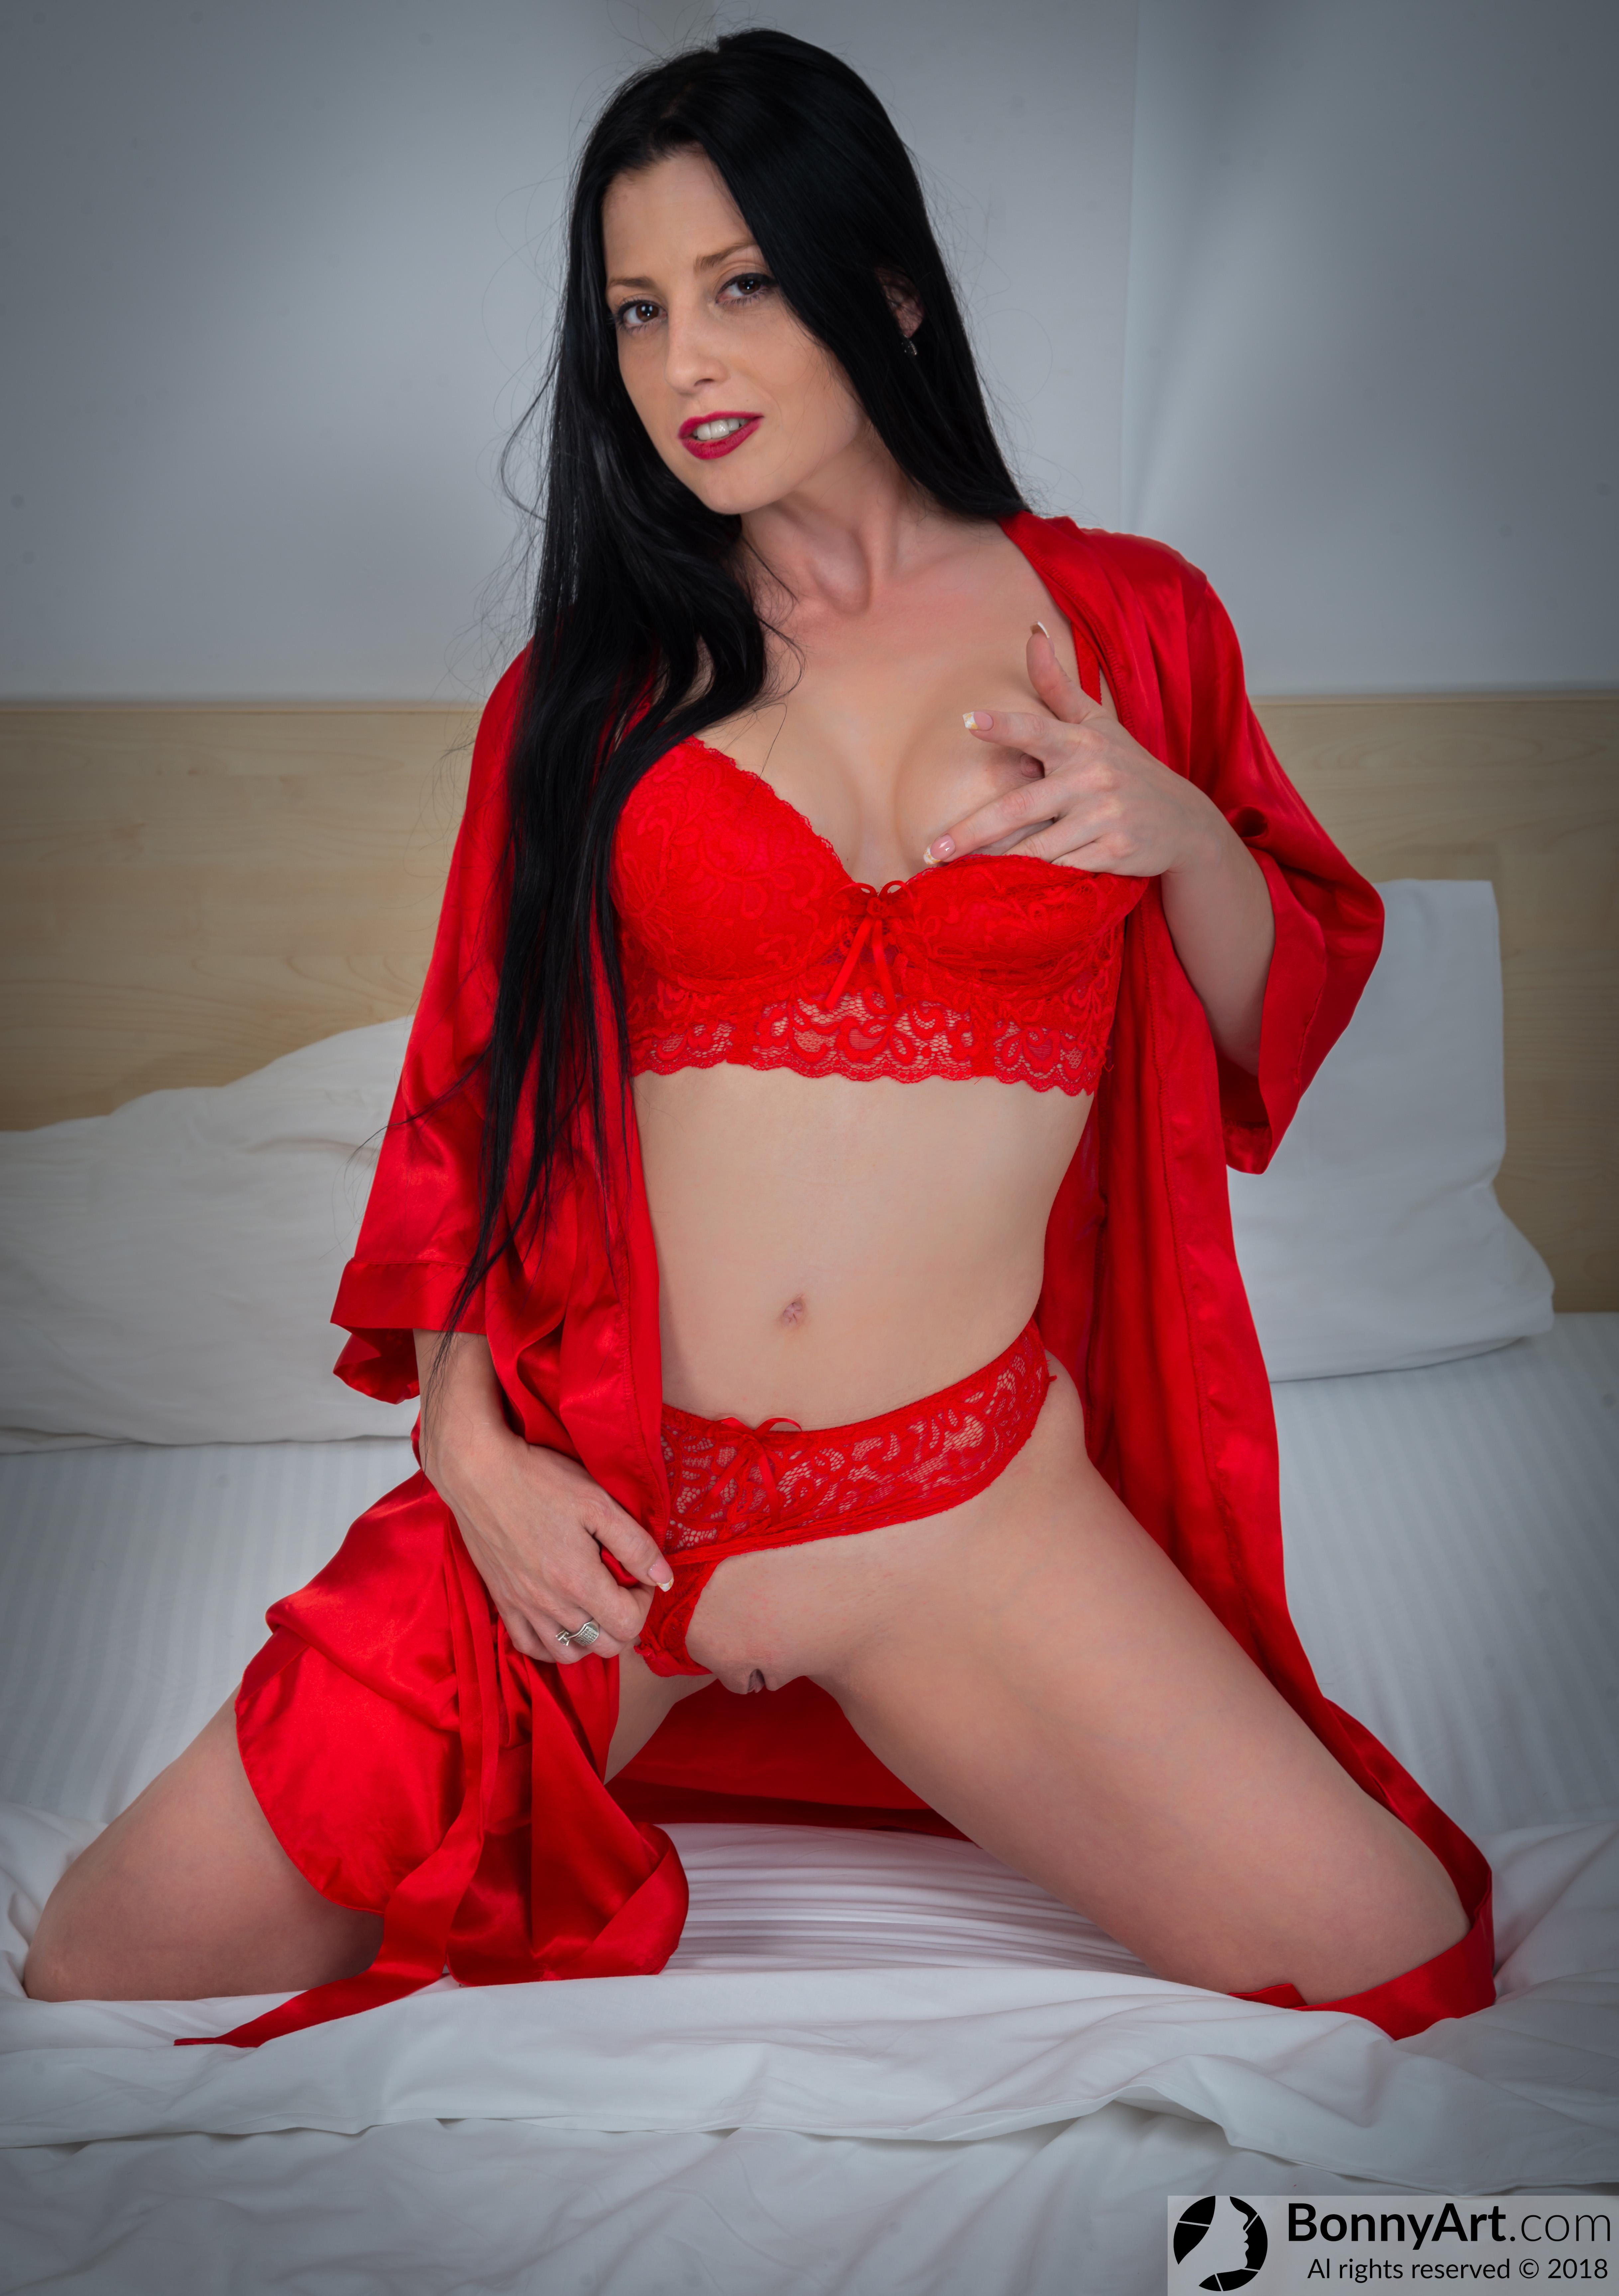 Sensual Hot Woman Flashing Pussy and Breast HD